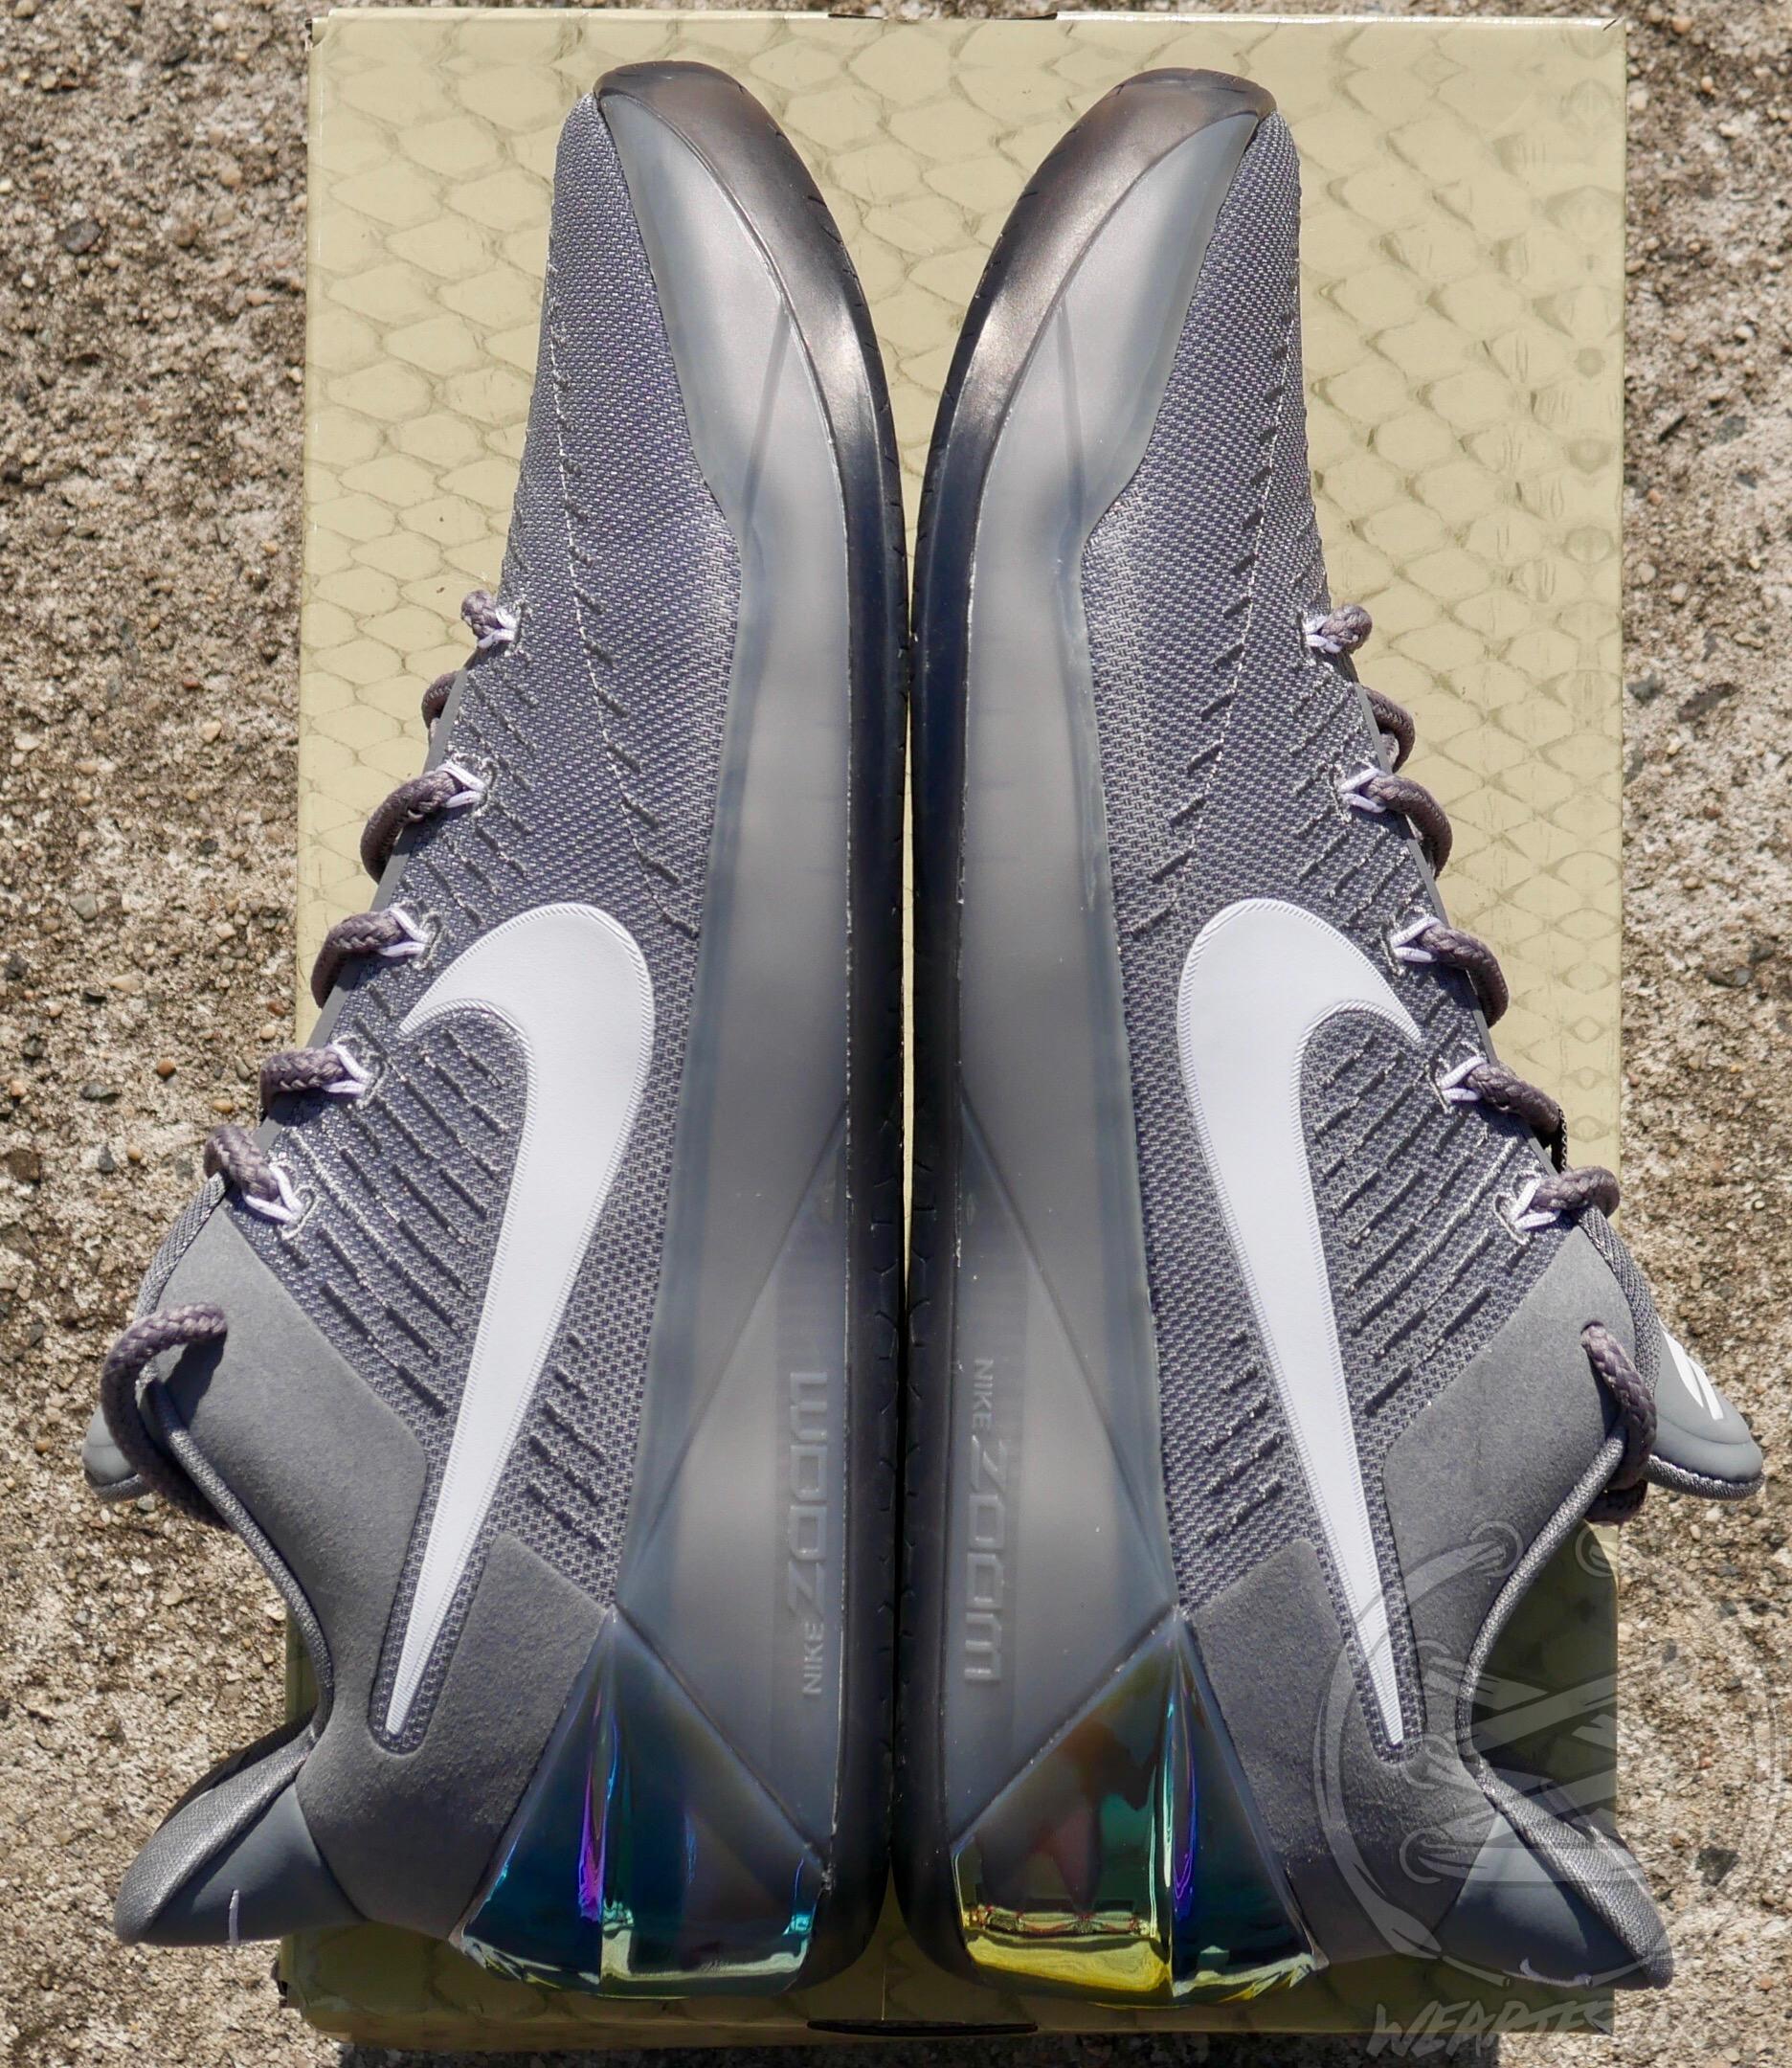 Upcoming Nike Kobe A.D. 'Cool Grey